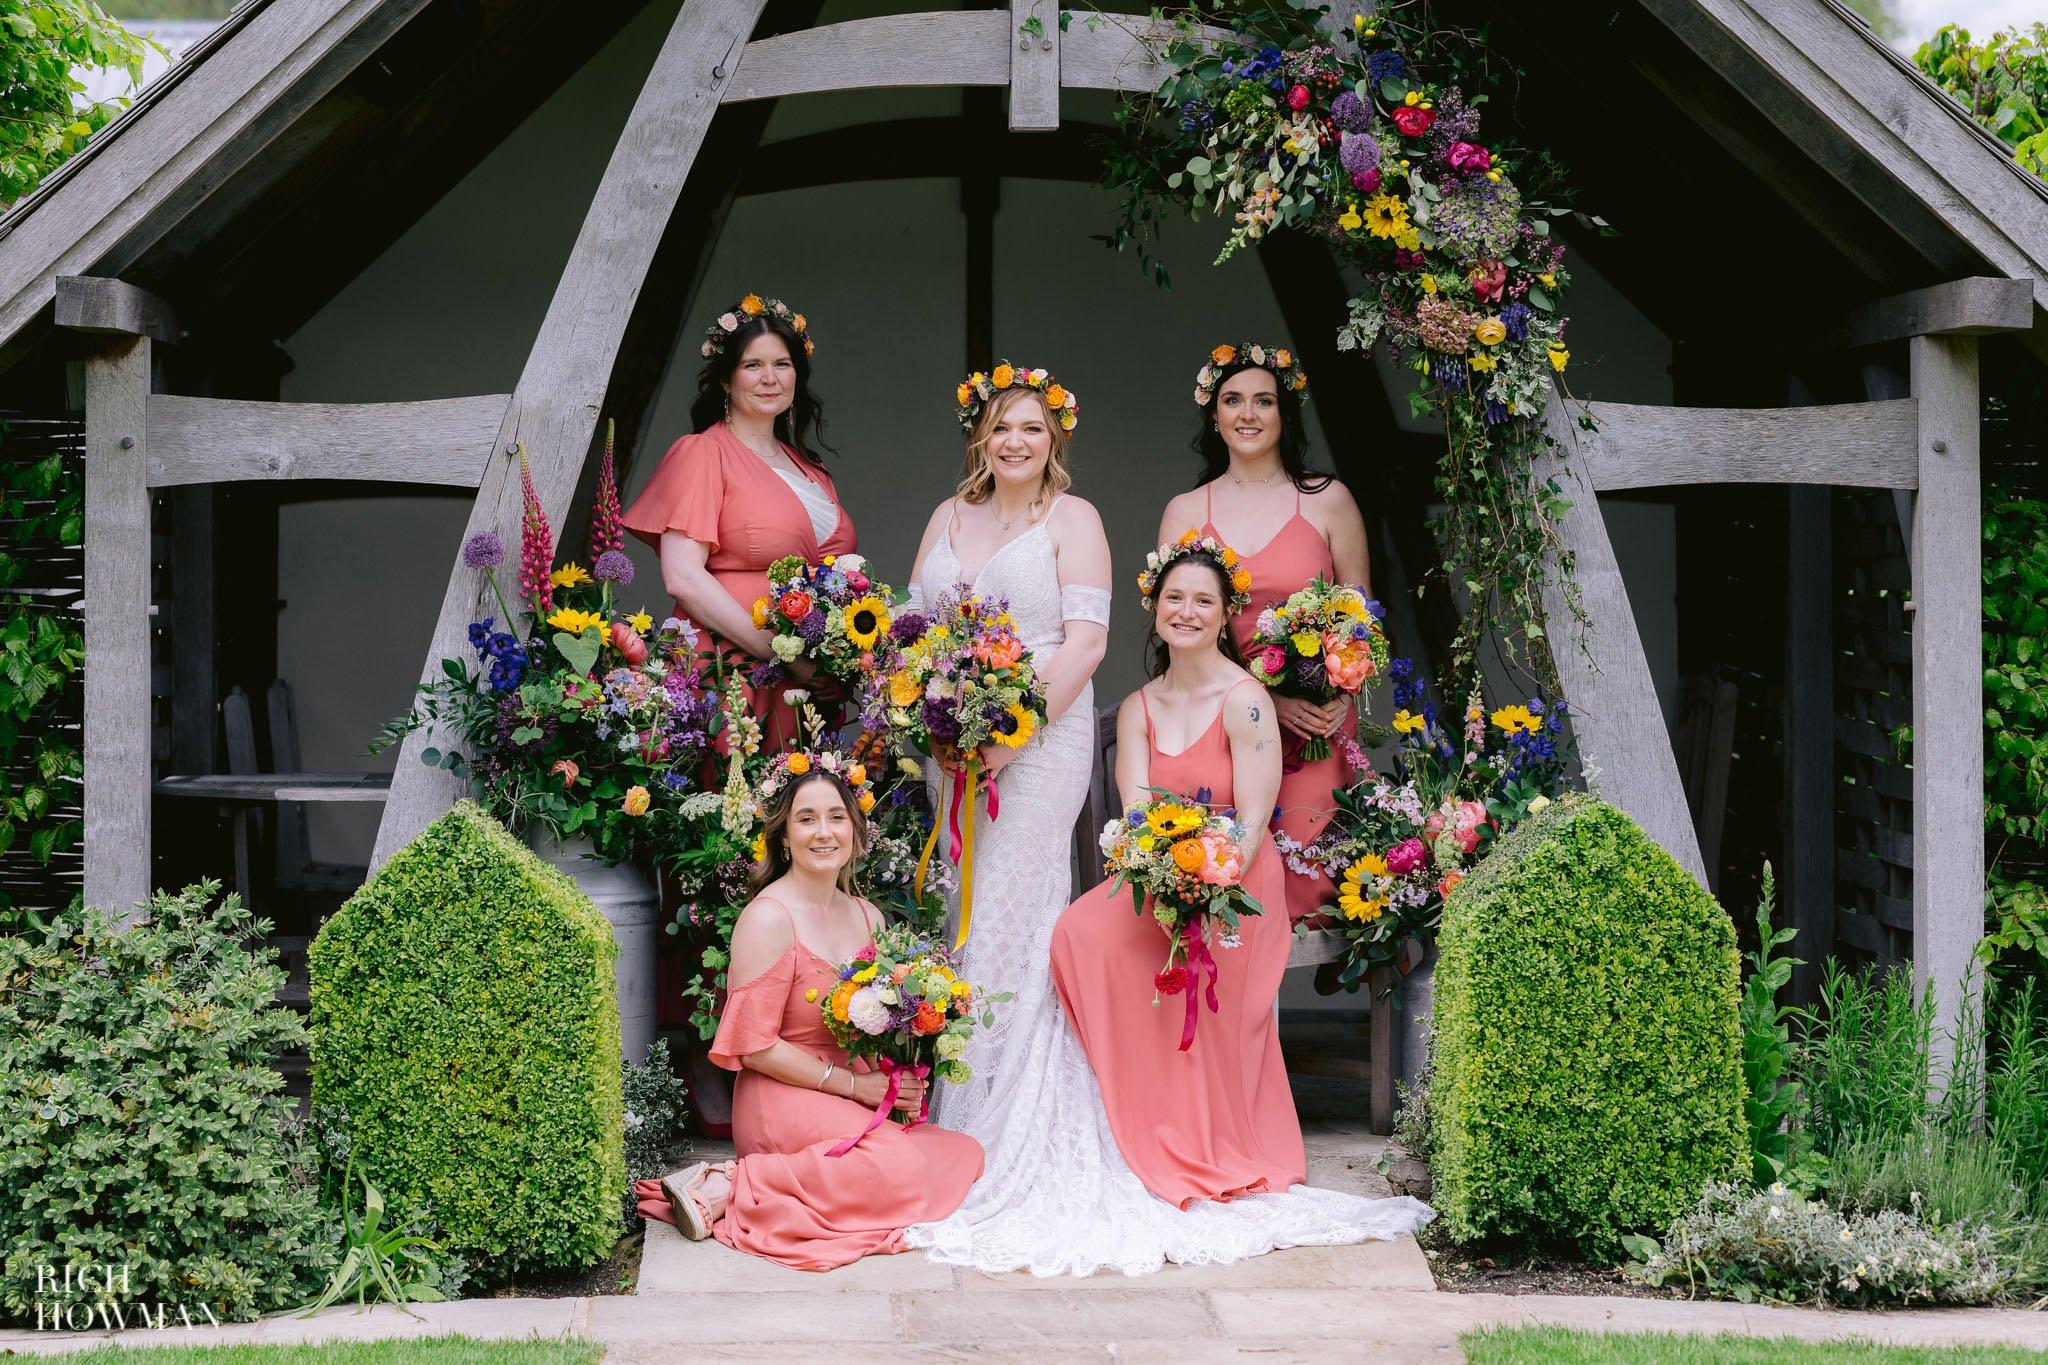 Gloucestershire Wedding Photographer - Joey and Jenessa 1